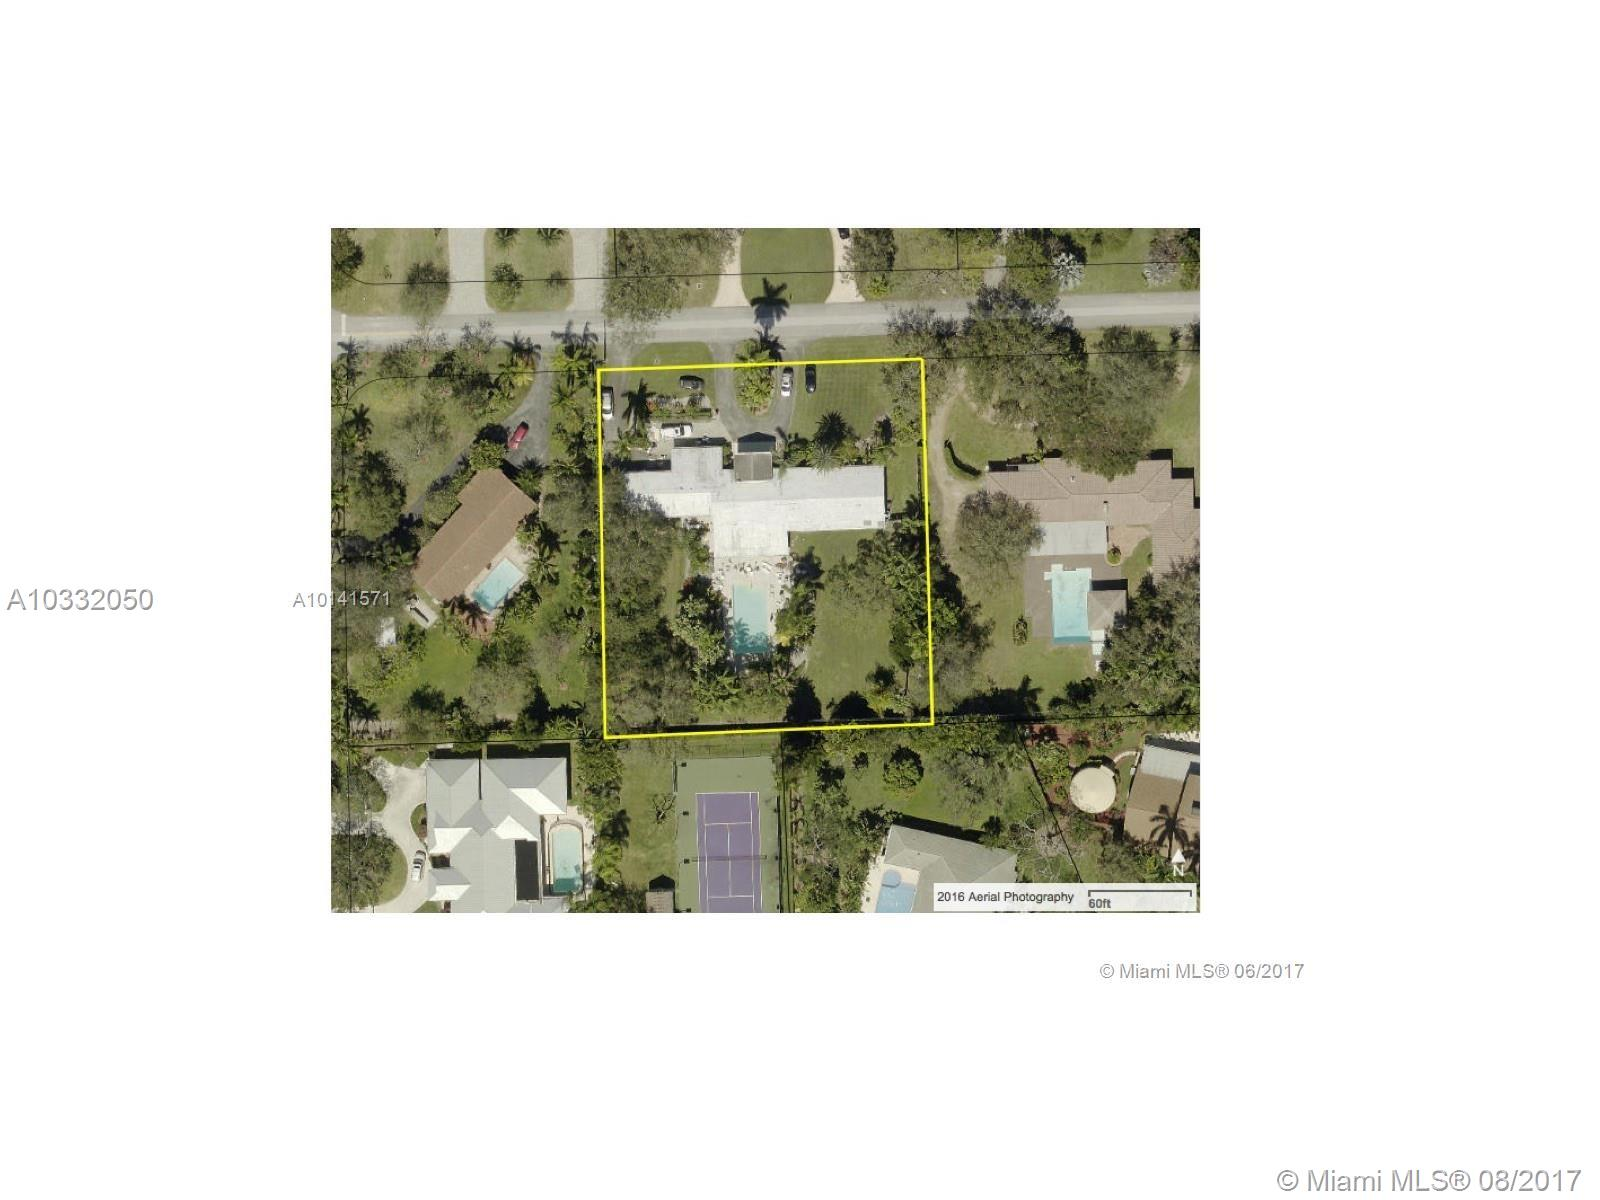 6180 Sw 133rd St, Pinecrest FL, 33156